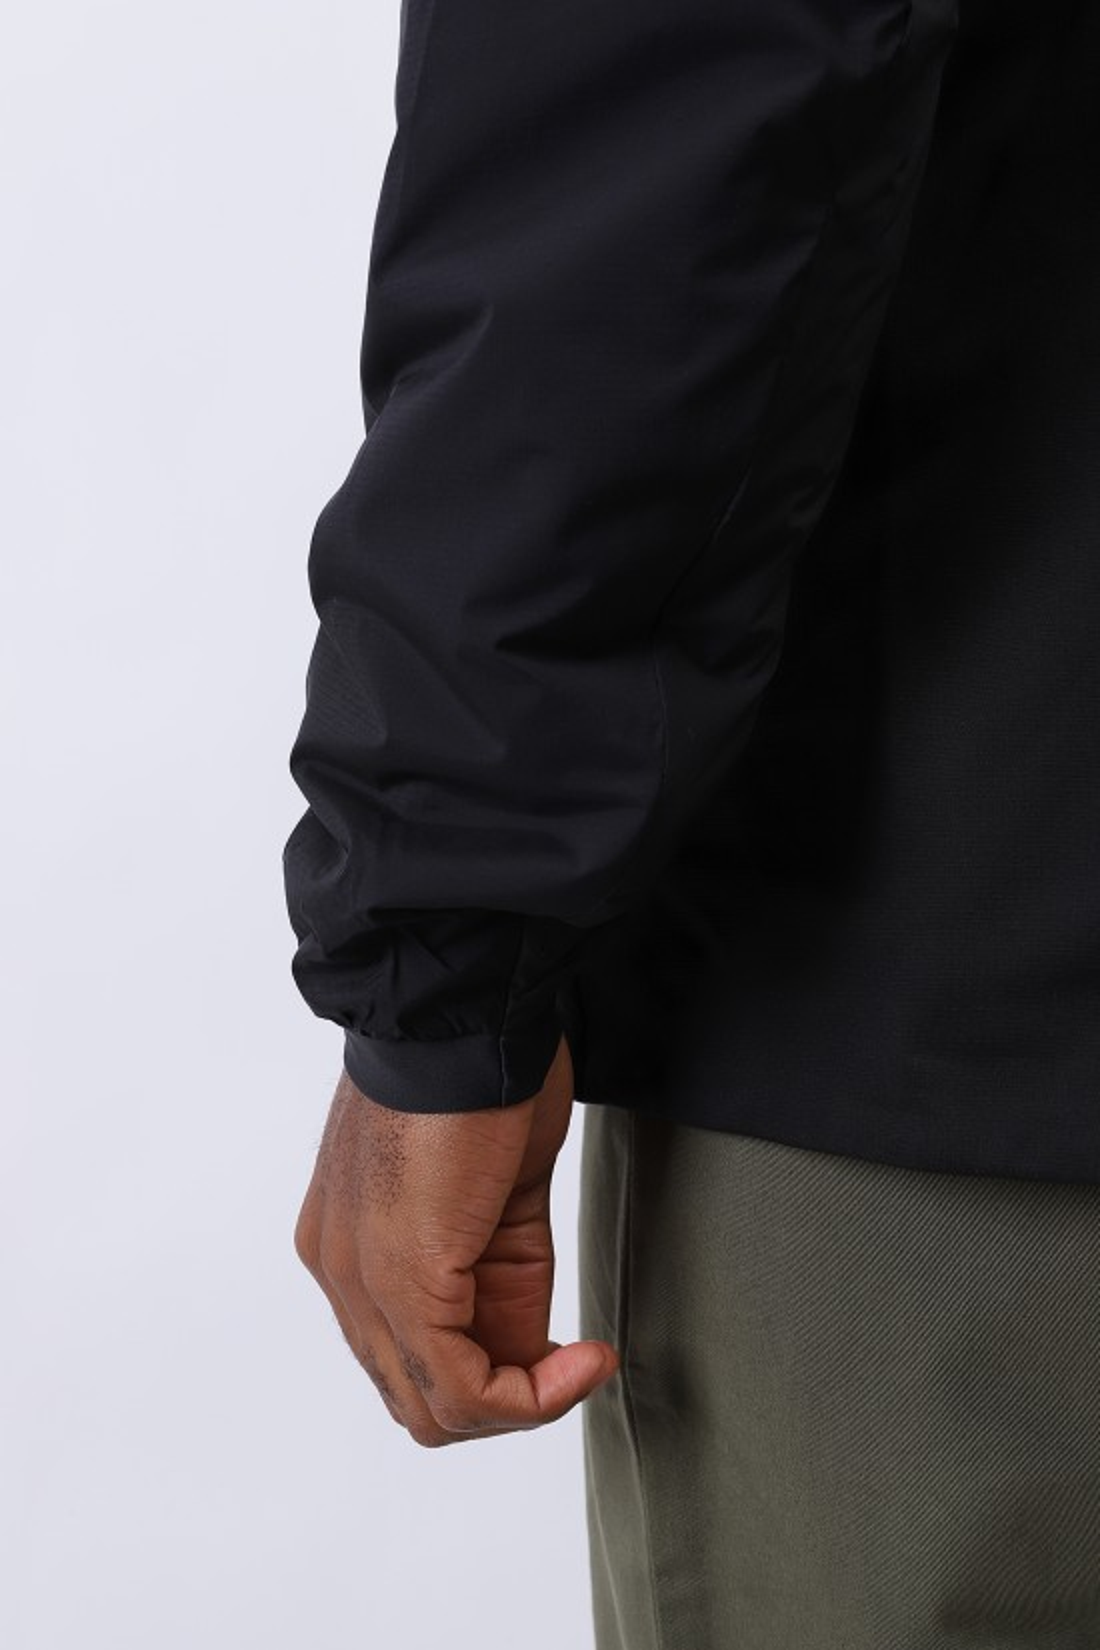 ARC'TERYX / Atom lt hoody mens Black